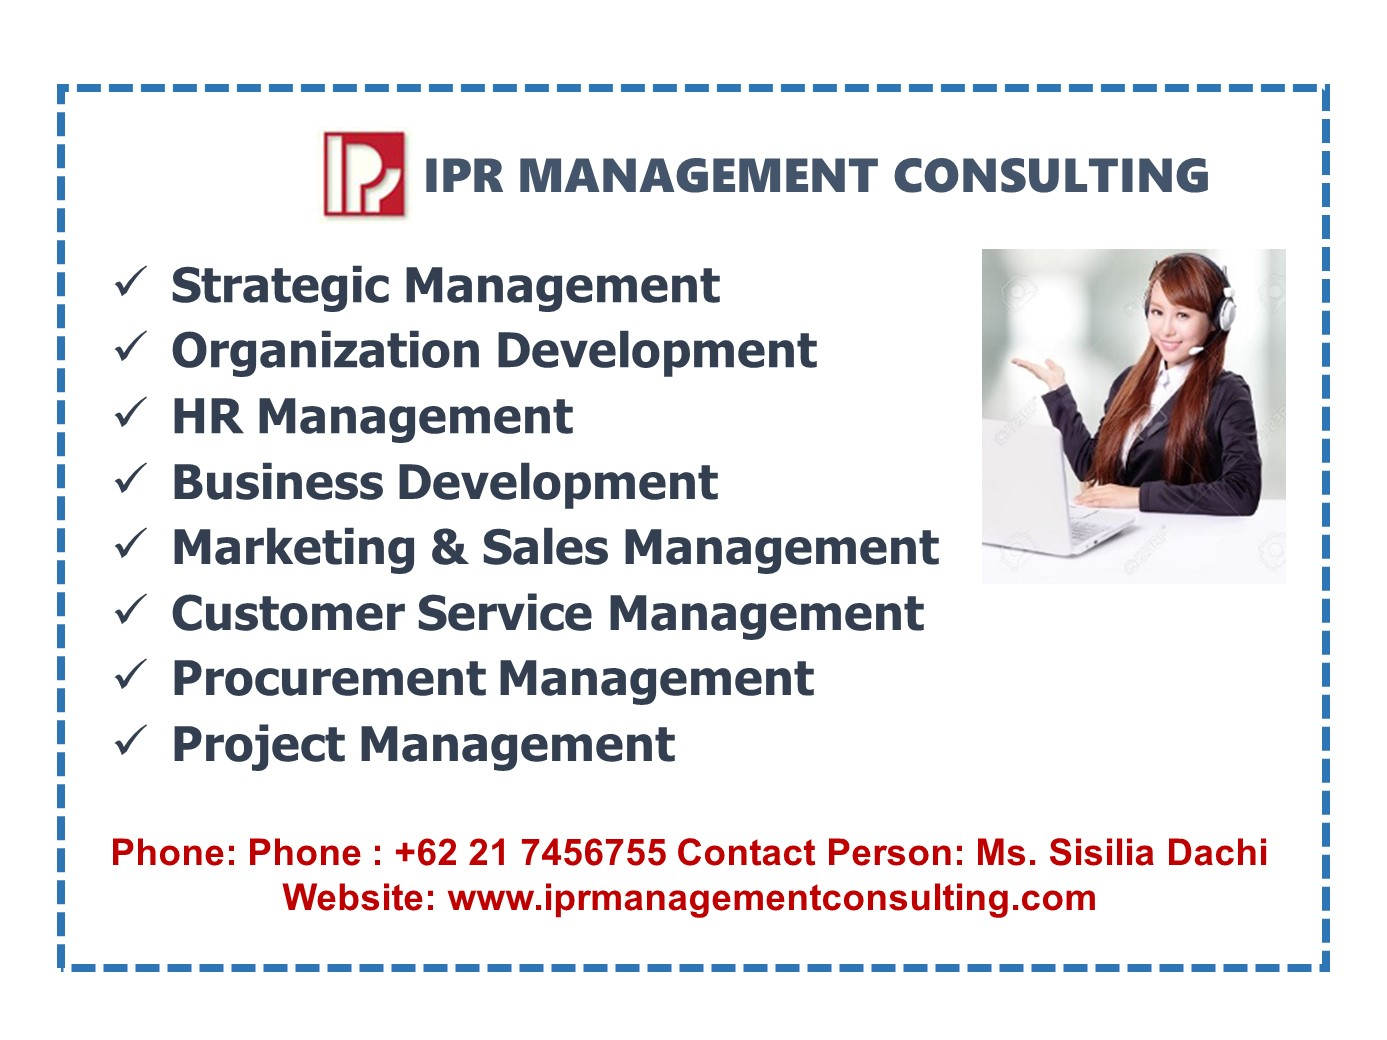 IPR Management Consulting